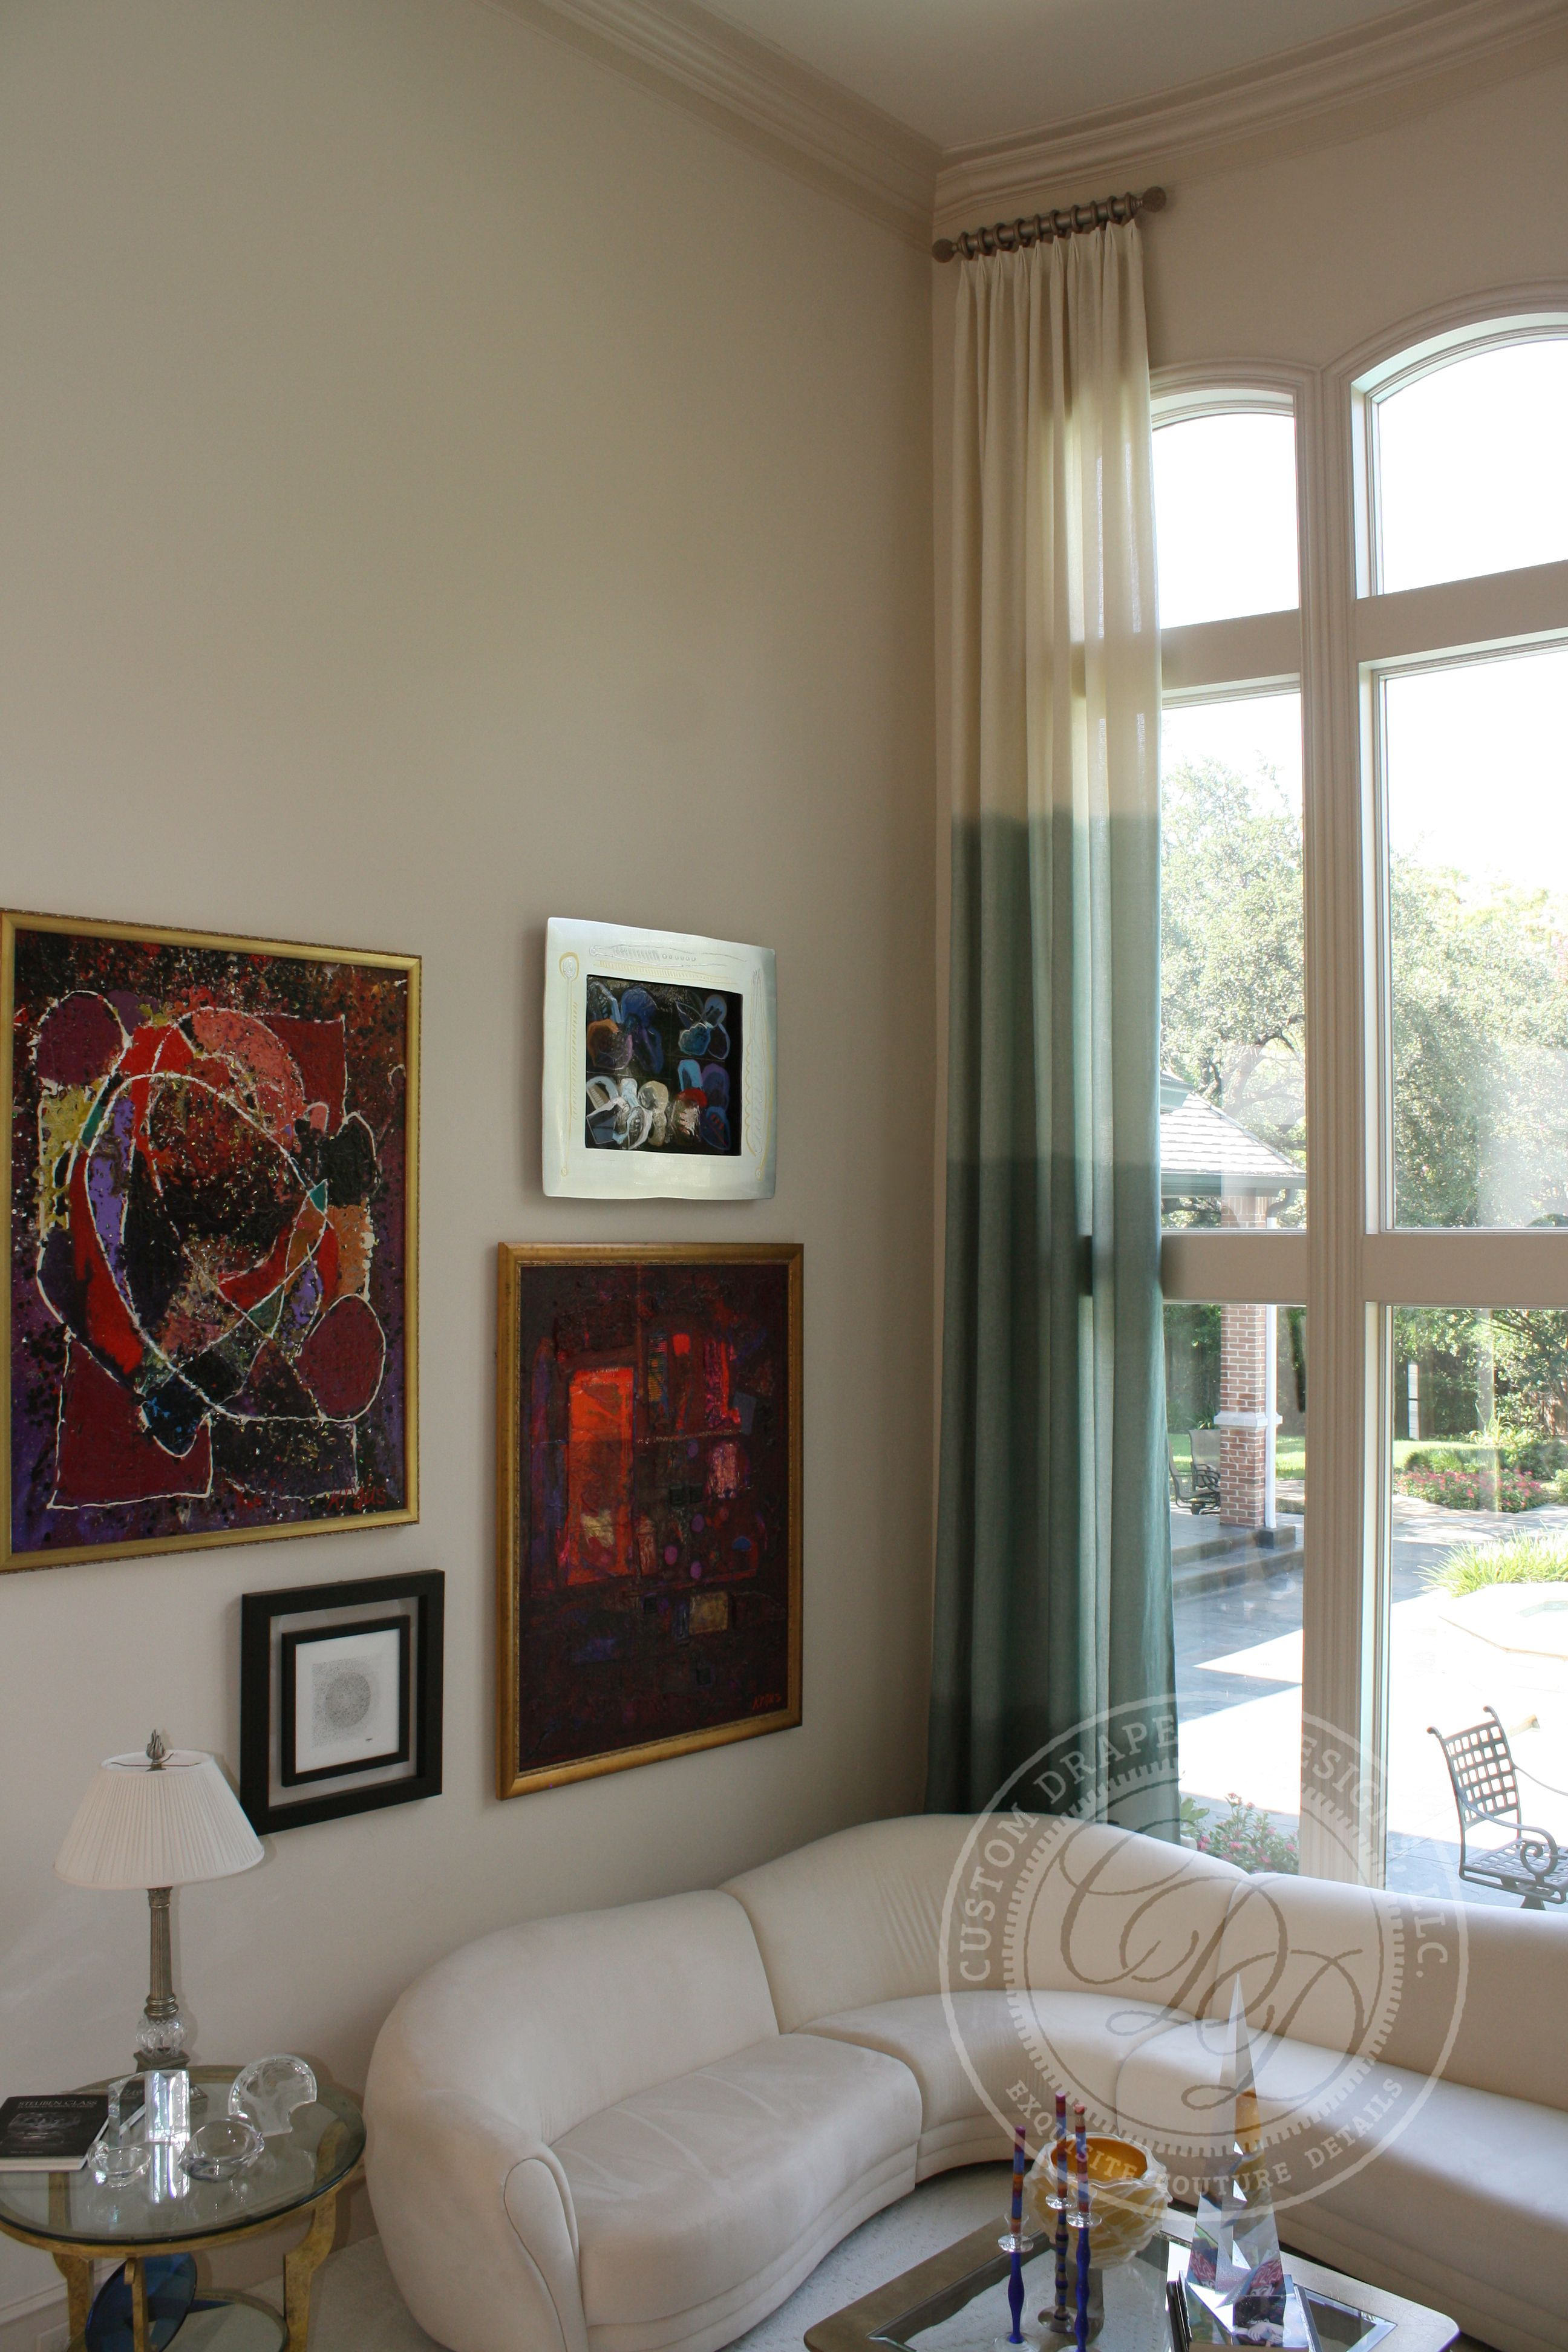 Window coverings for 2 story windows  custom drapery designs llc  drapery  home decor  windows